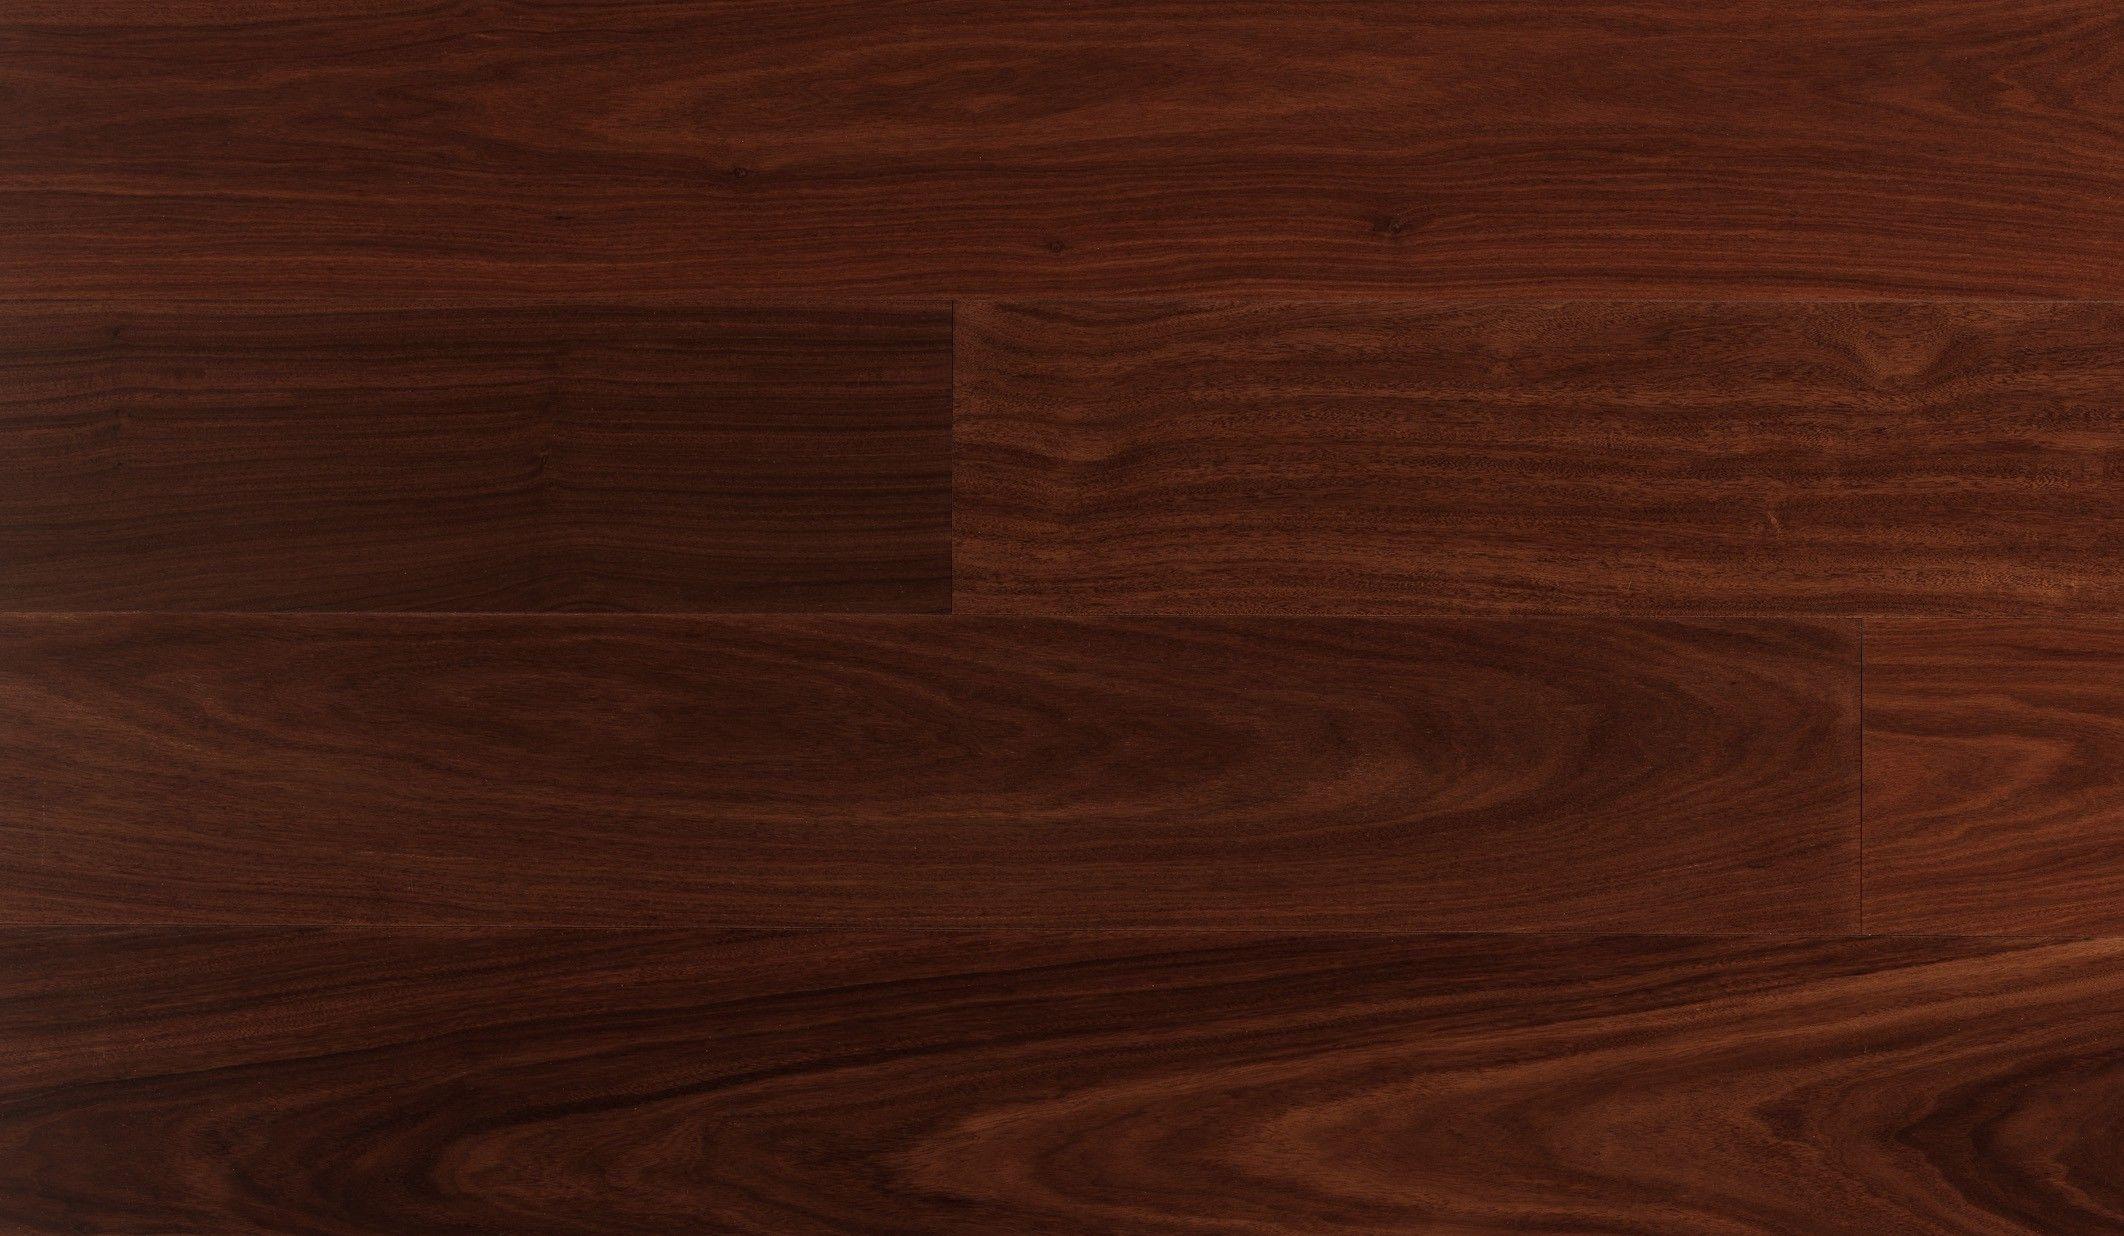 dark brown wood floor texture. Closet wood  Textures Pinterest Dark texture Texture design and